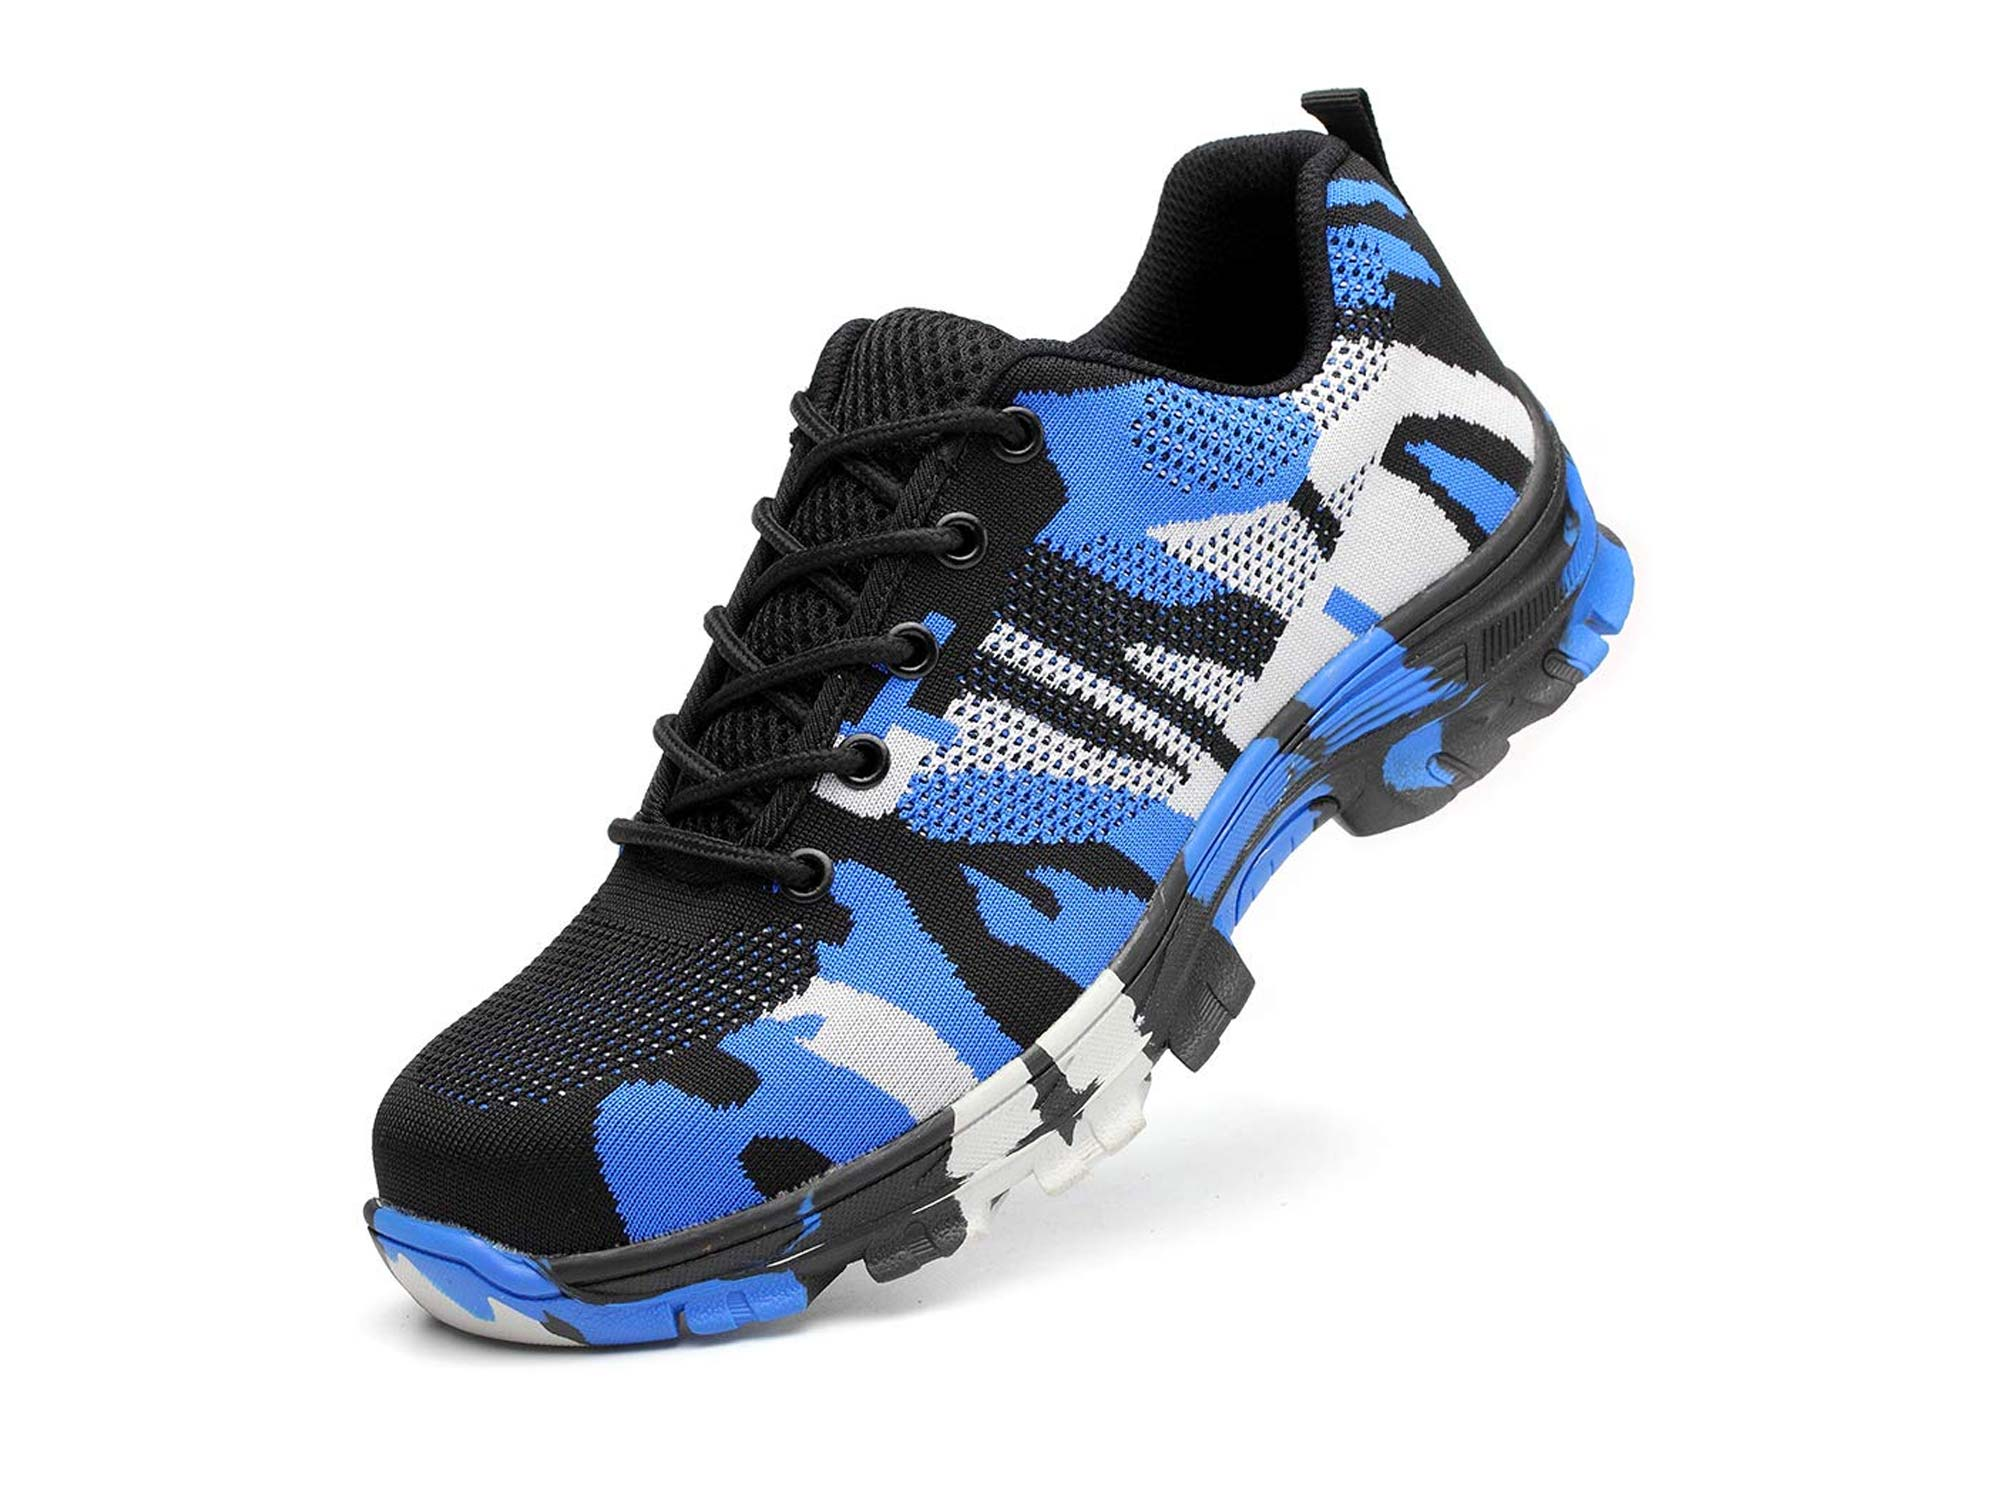 Ticcoon steel toe camouflage sneaker